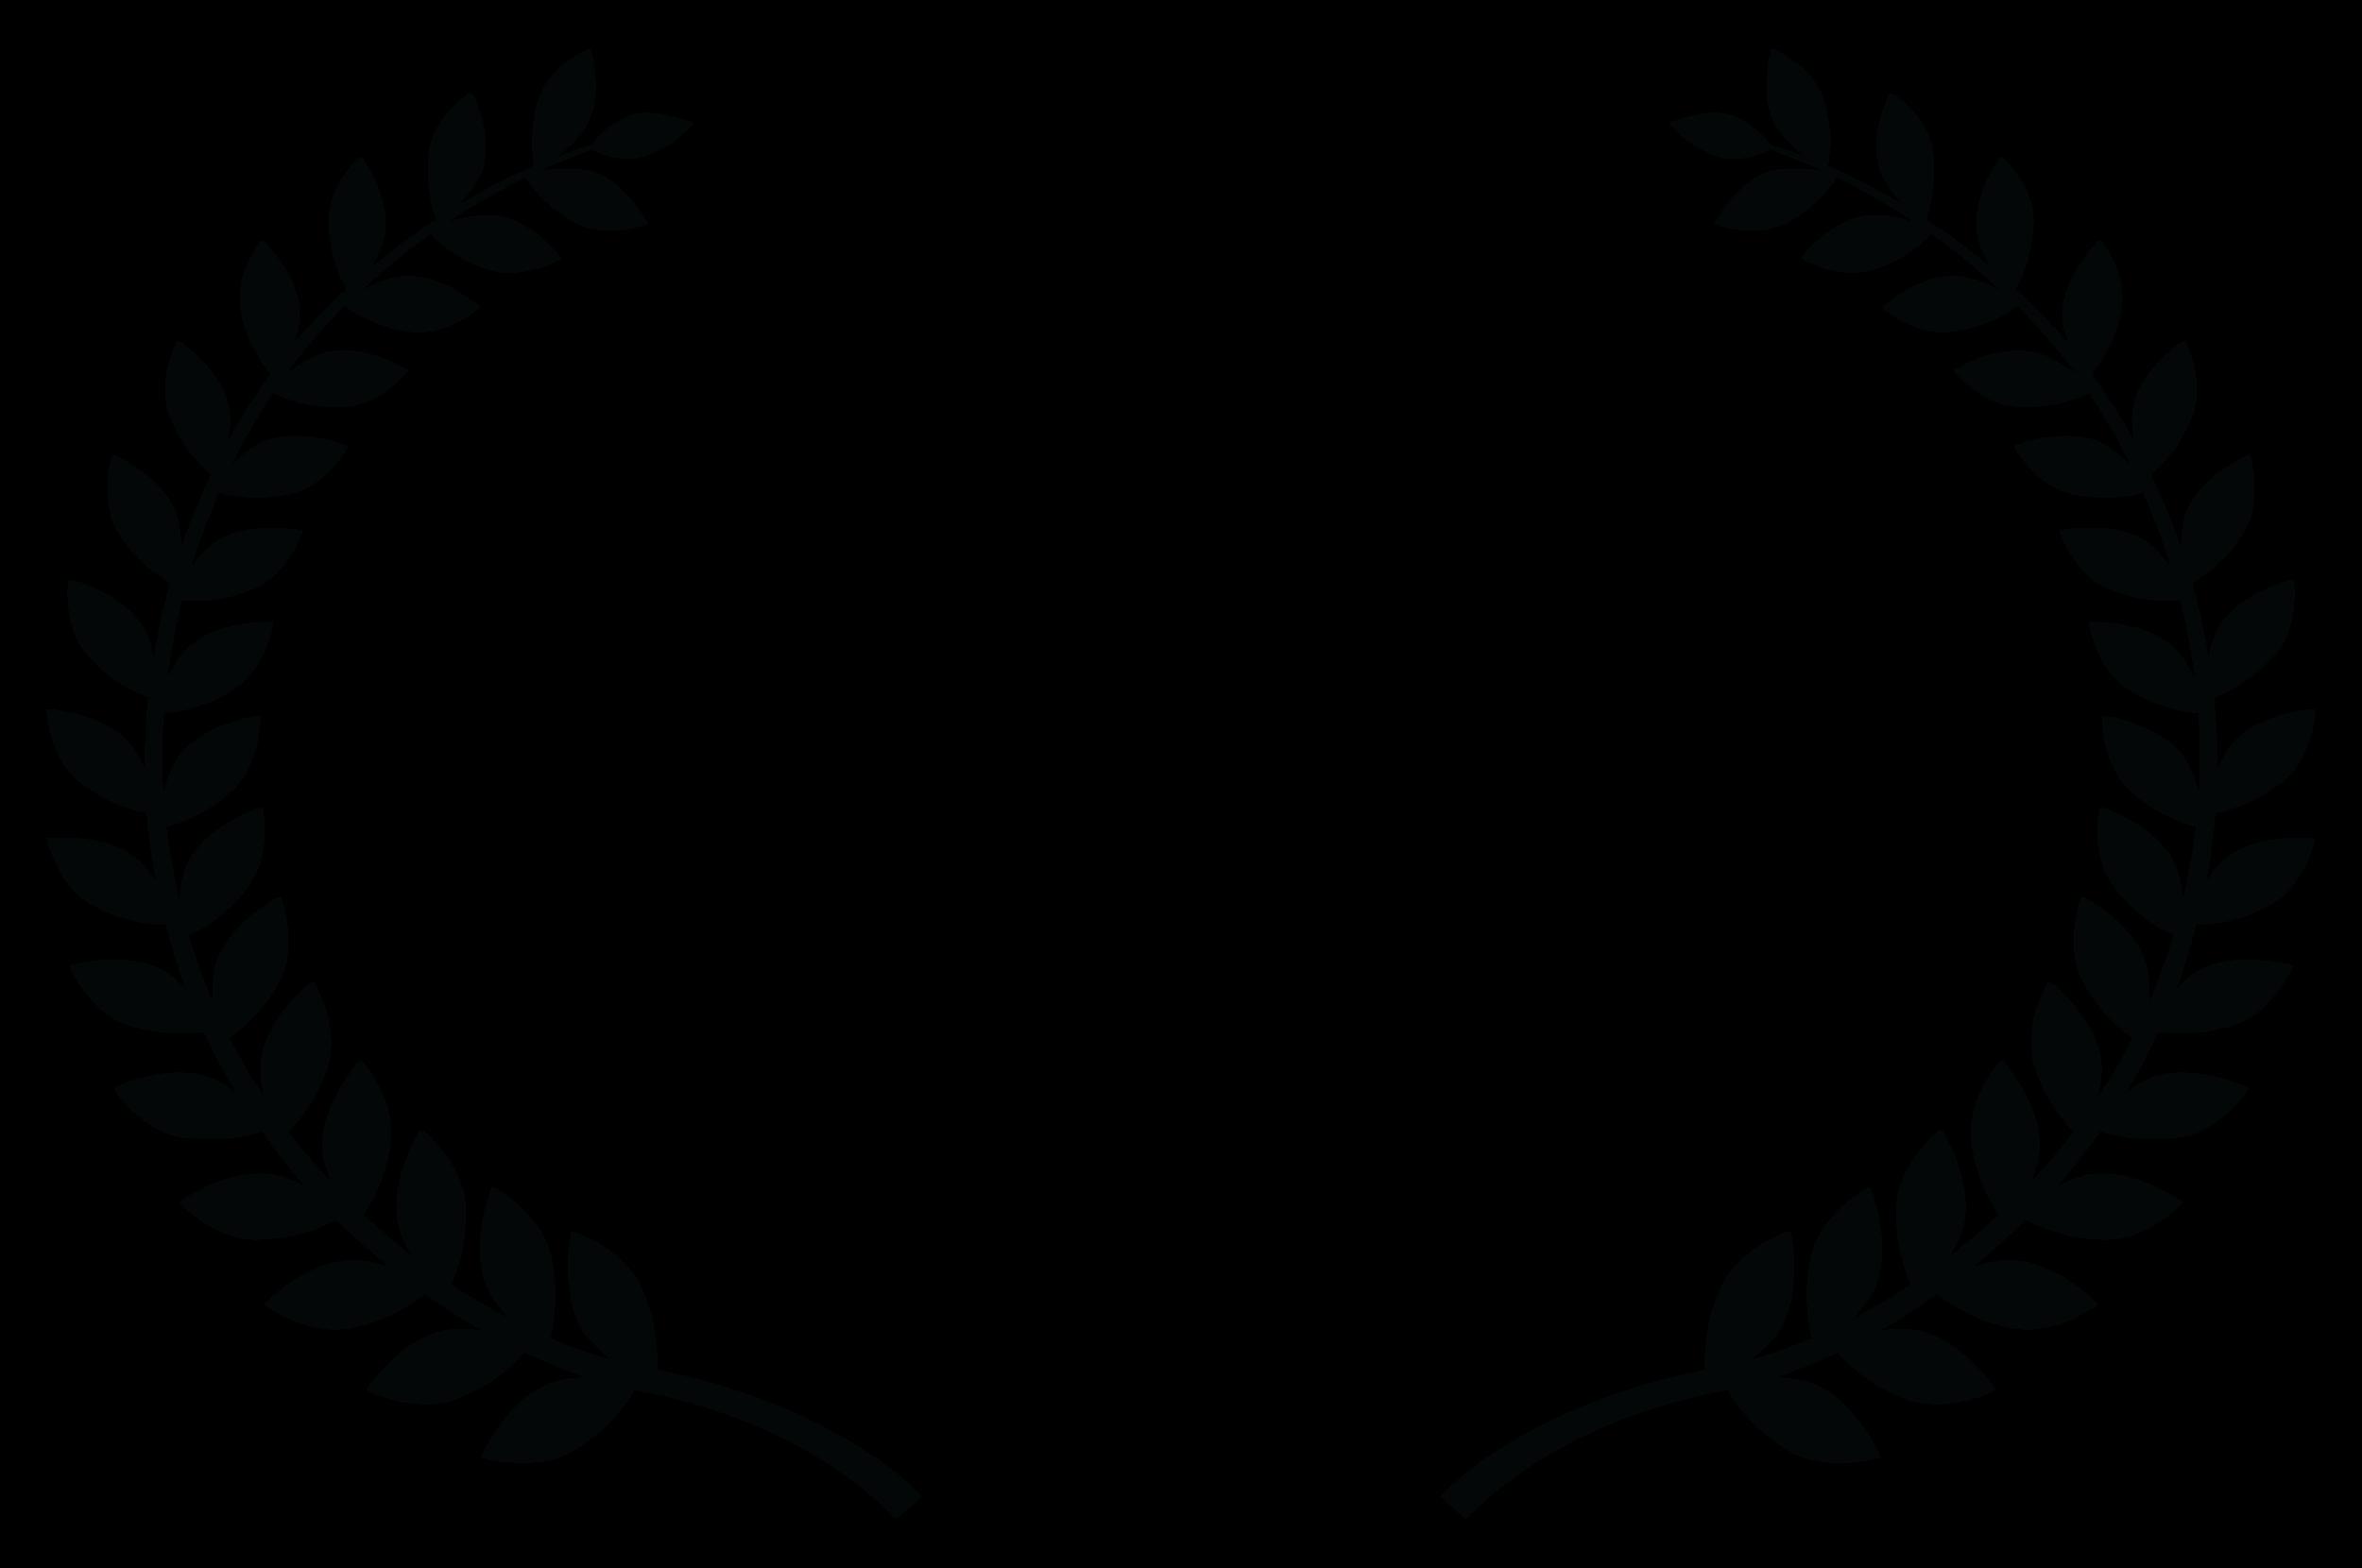 OFFICIALSELECTION-TheBuddhaInternationalFilmFestival-2019.png